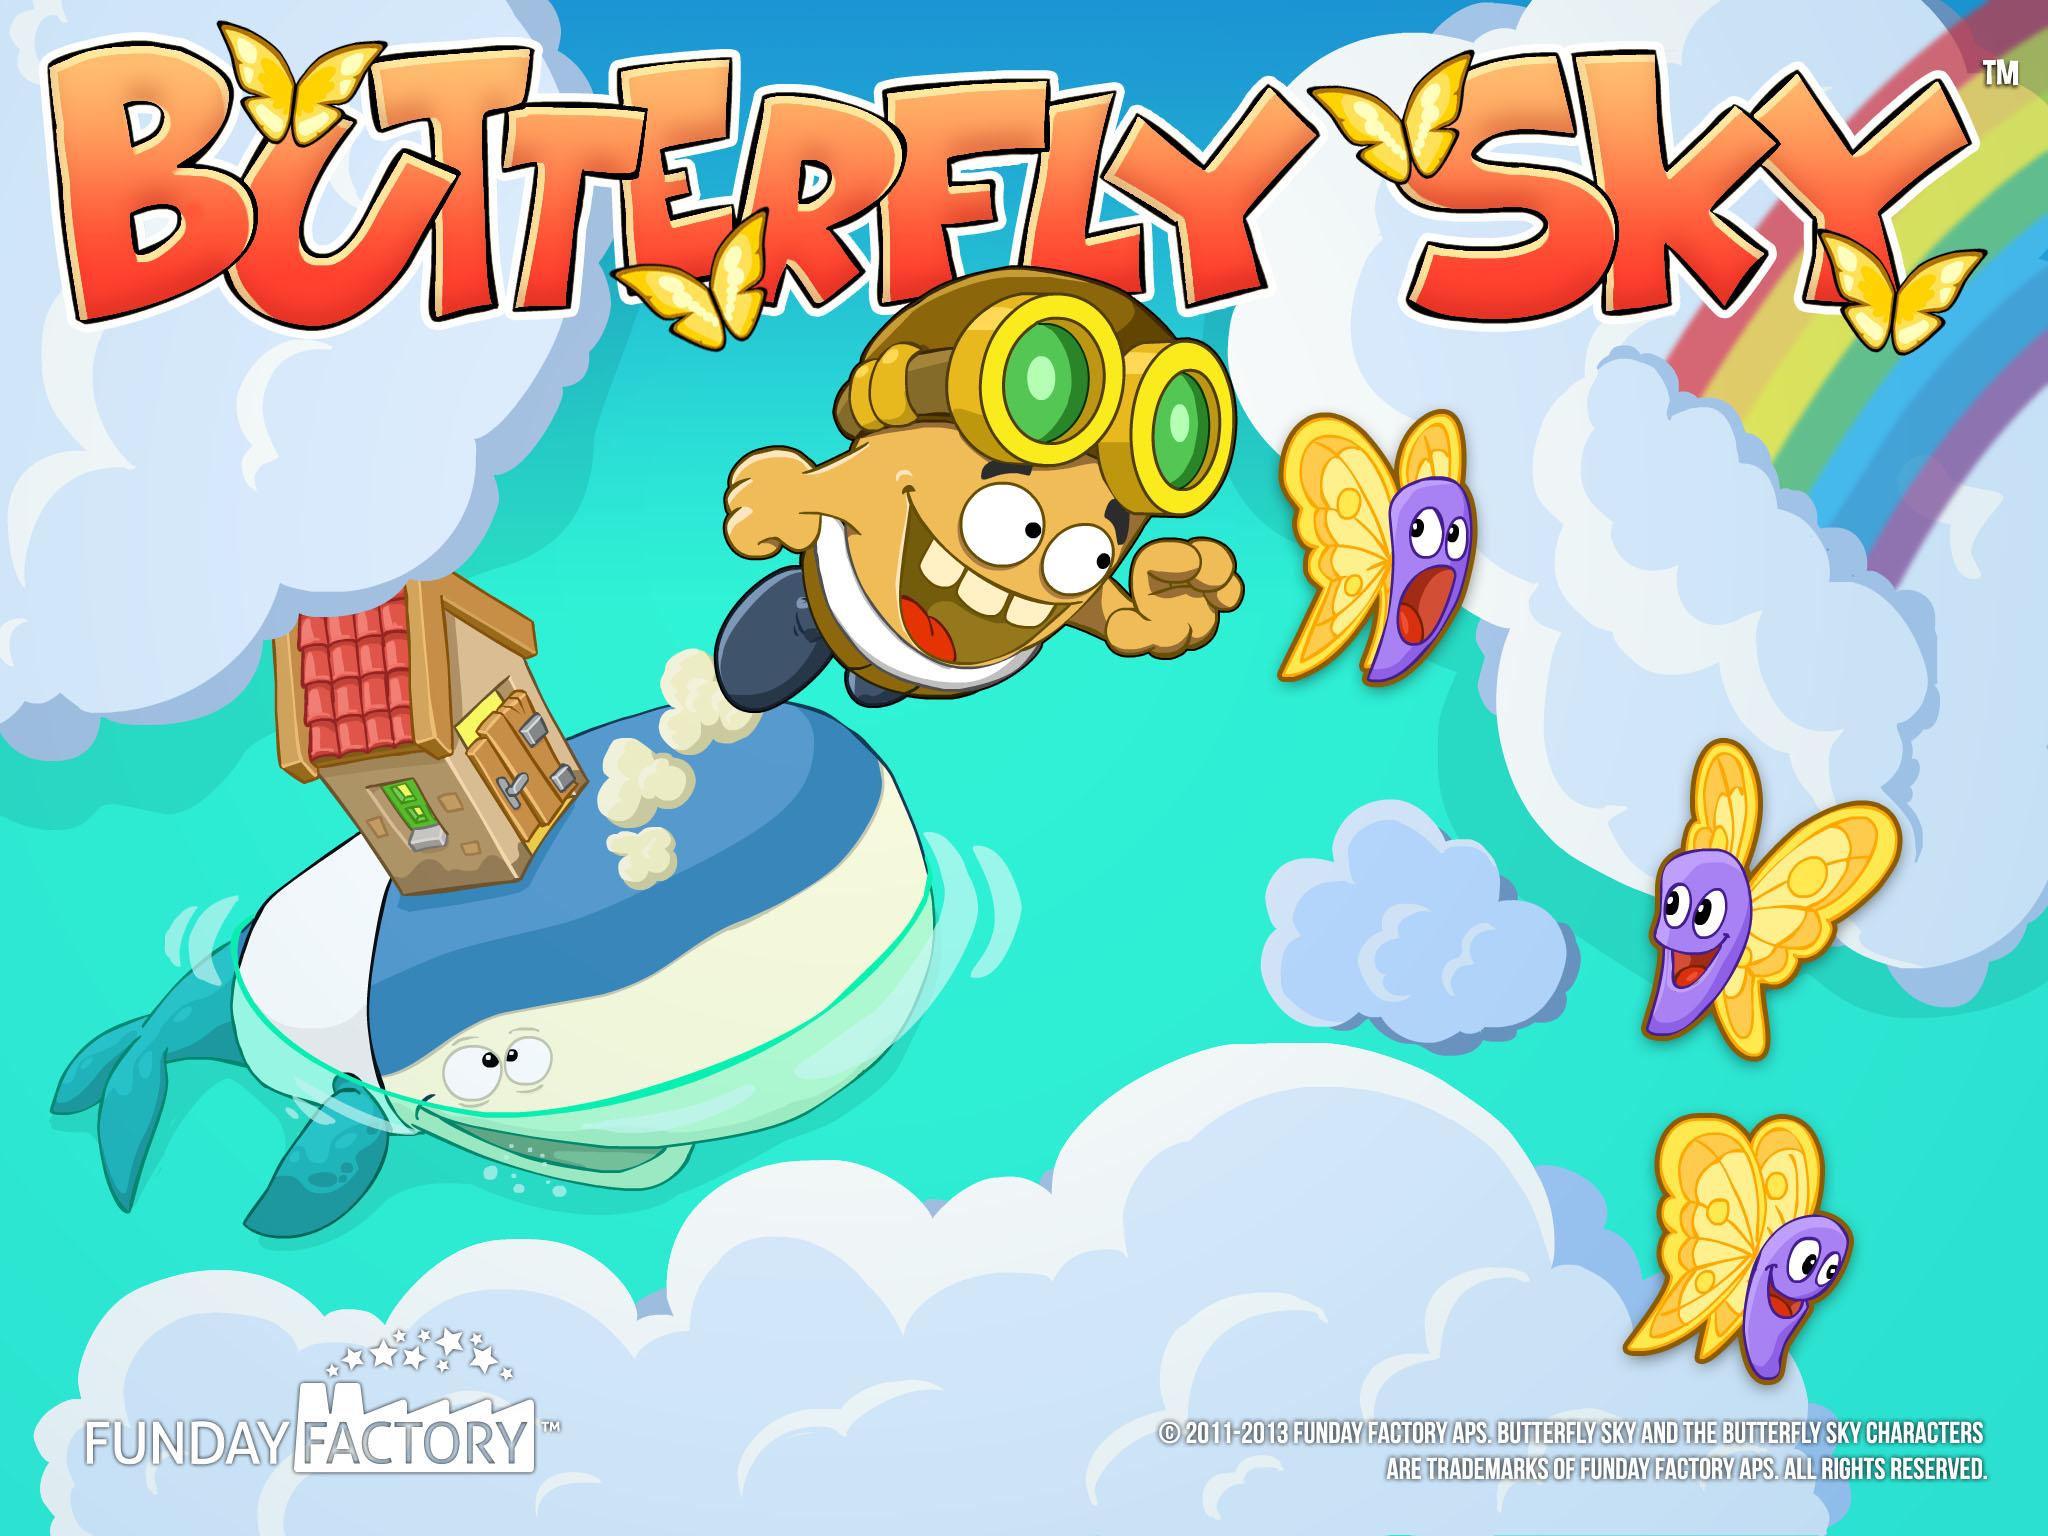 Entertainment Seeks New Adventurers